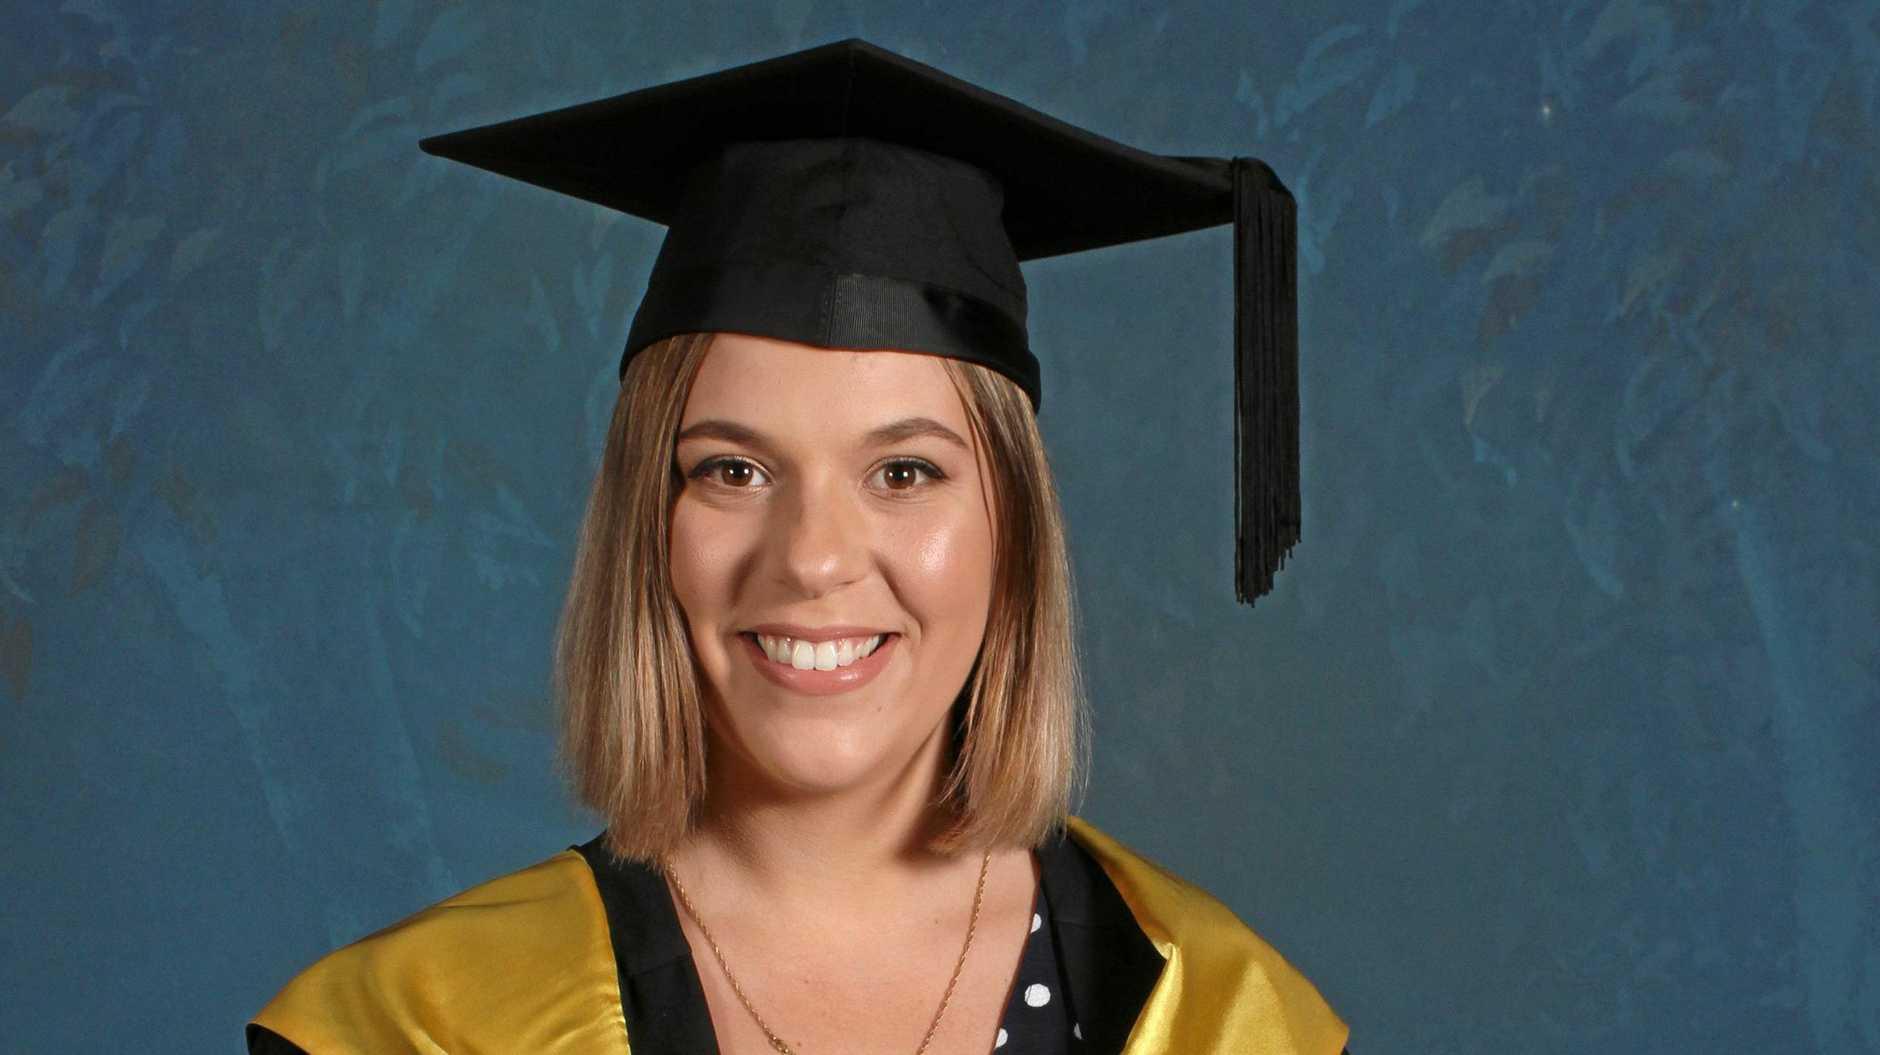 IMPORTANT JOB: Former Riverside Christian College co-captain Stefanie Csonka has begun a career in education.